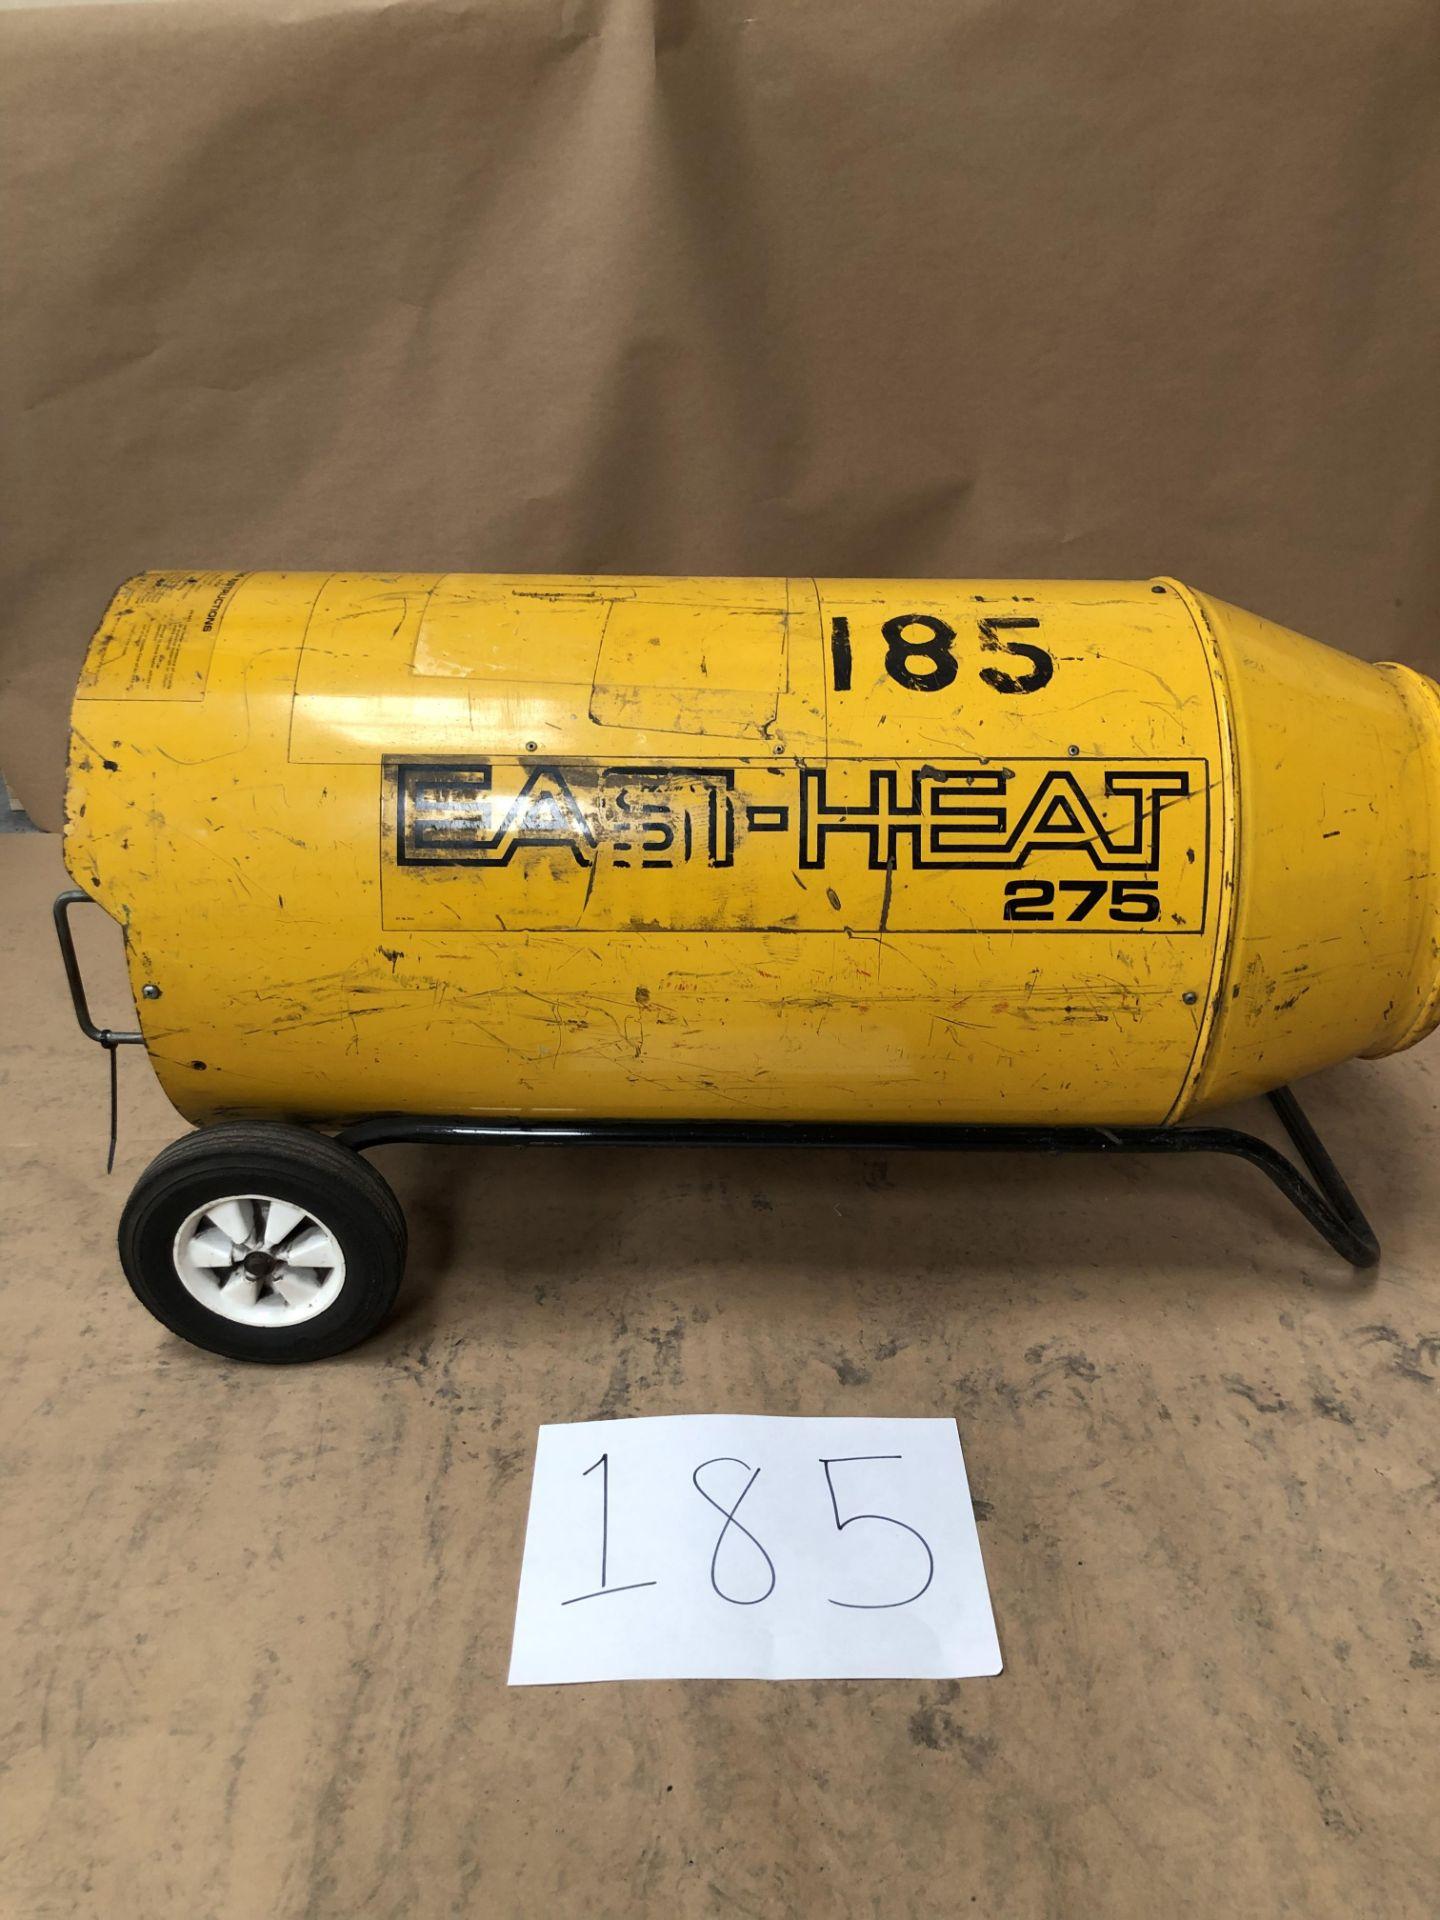 Easyheater 275 Propane Heater - Image 2 of 3